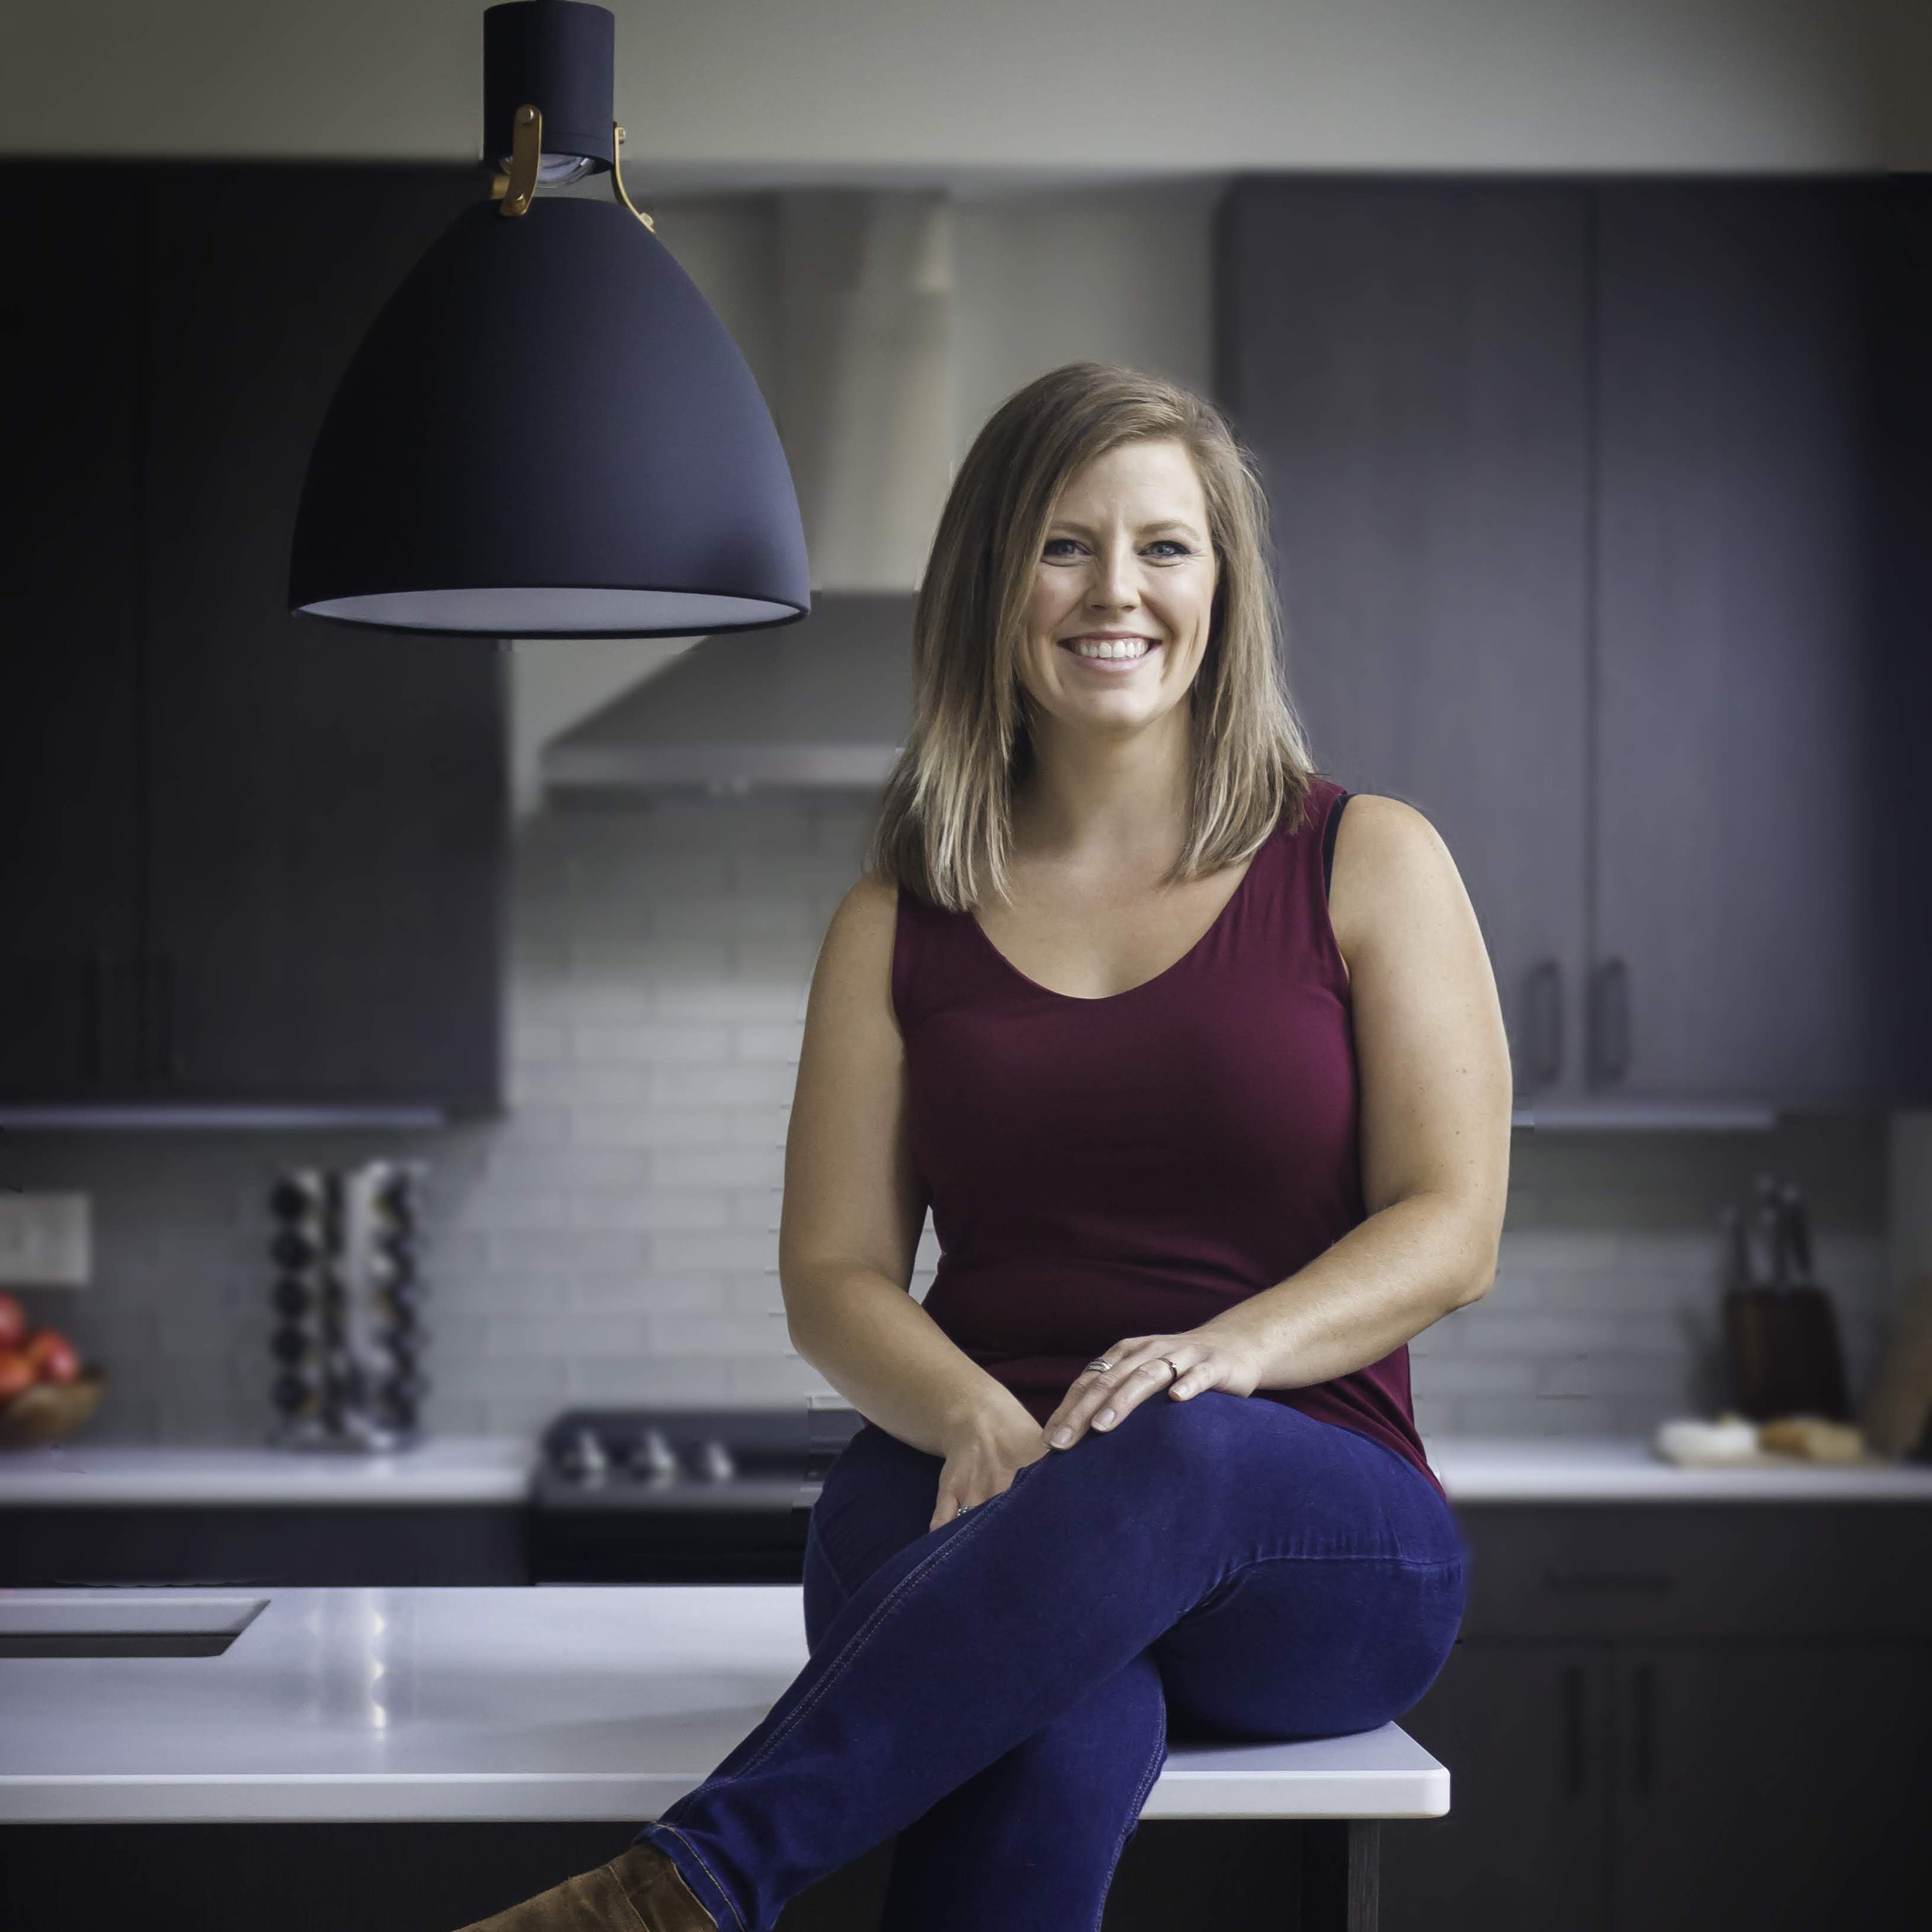 Jessica Herbst